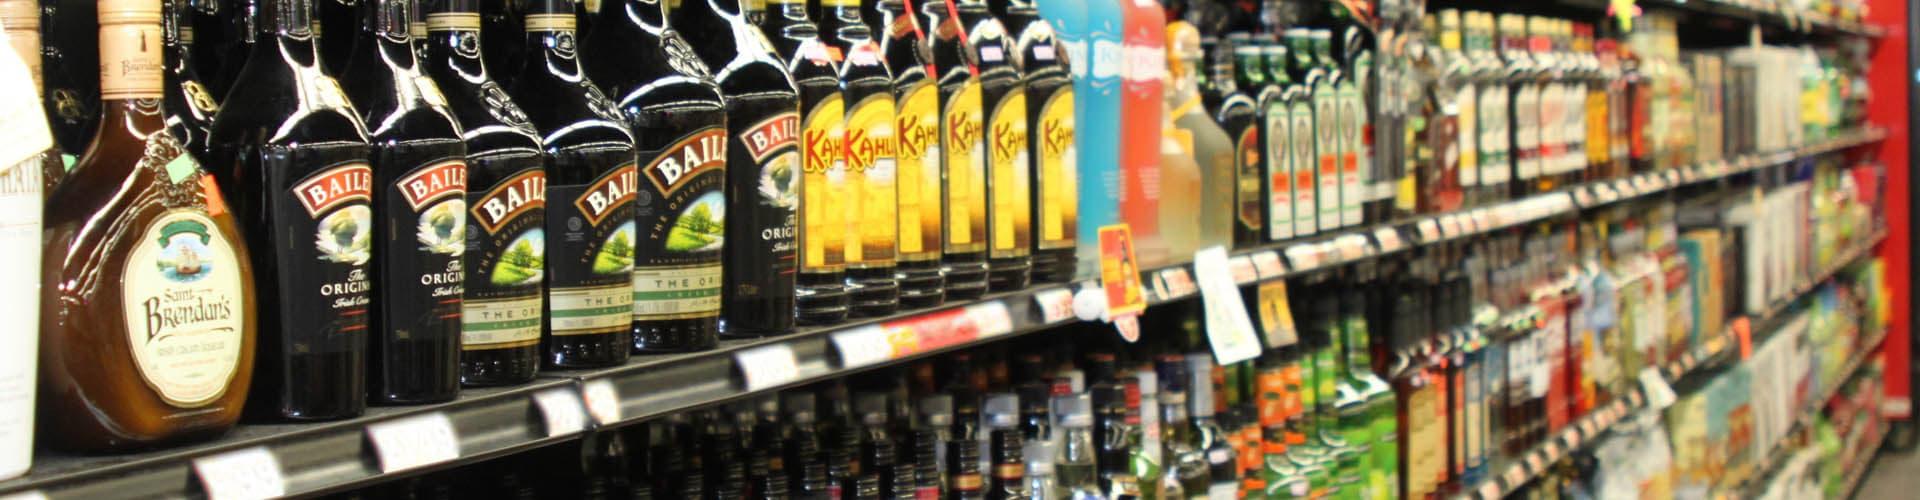 liquor store pos system, Liquor Store POS System